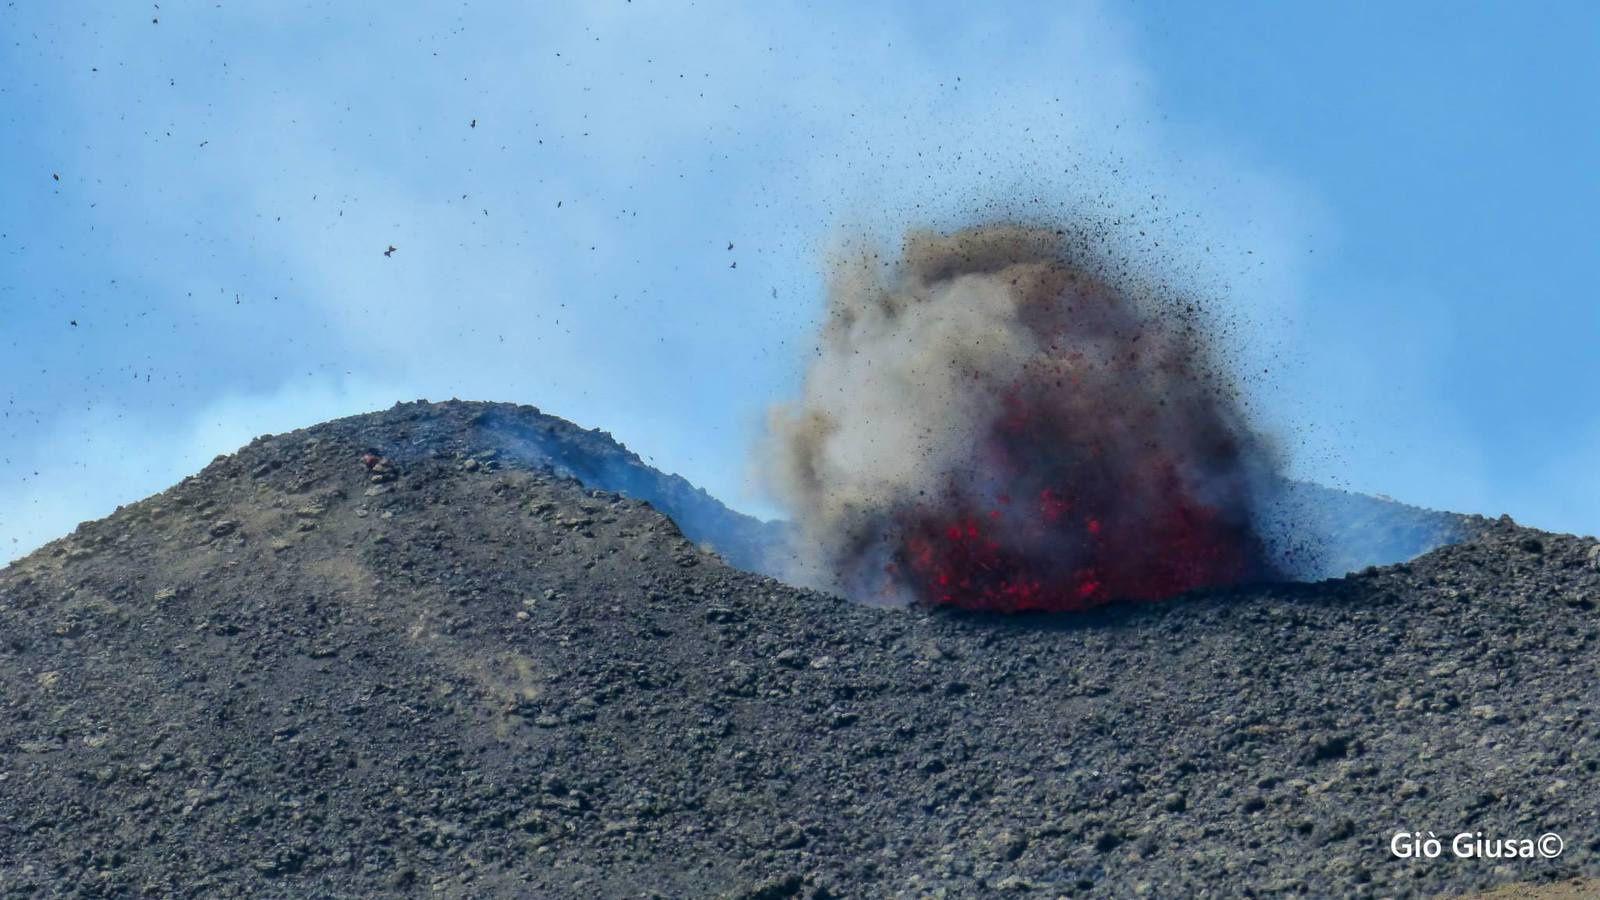 Etna NEC : on the eruptive fissure at 3150 m altitude, the 08/02/2014 -. photo Gio Giusa